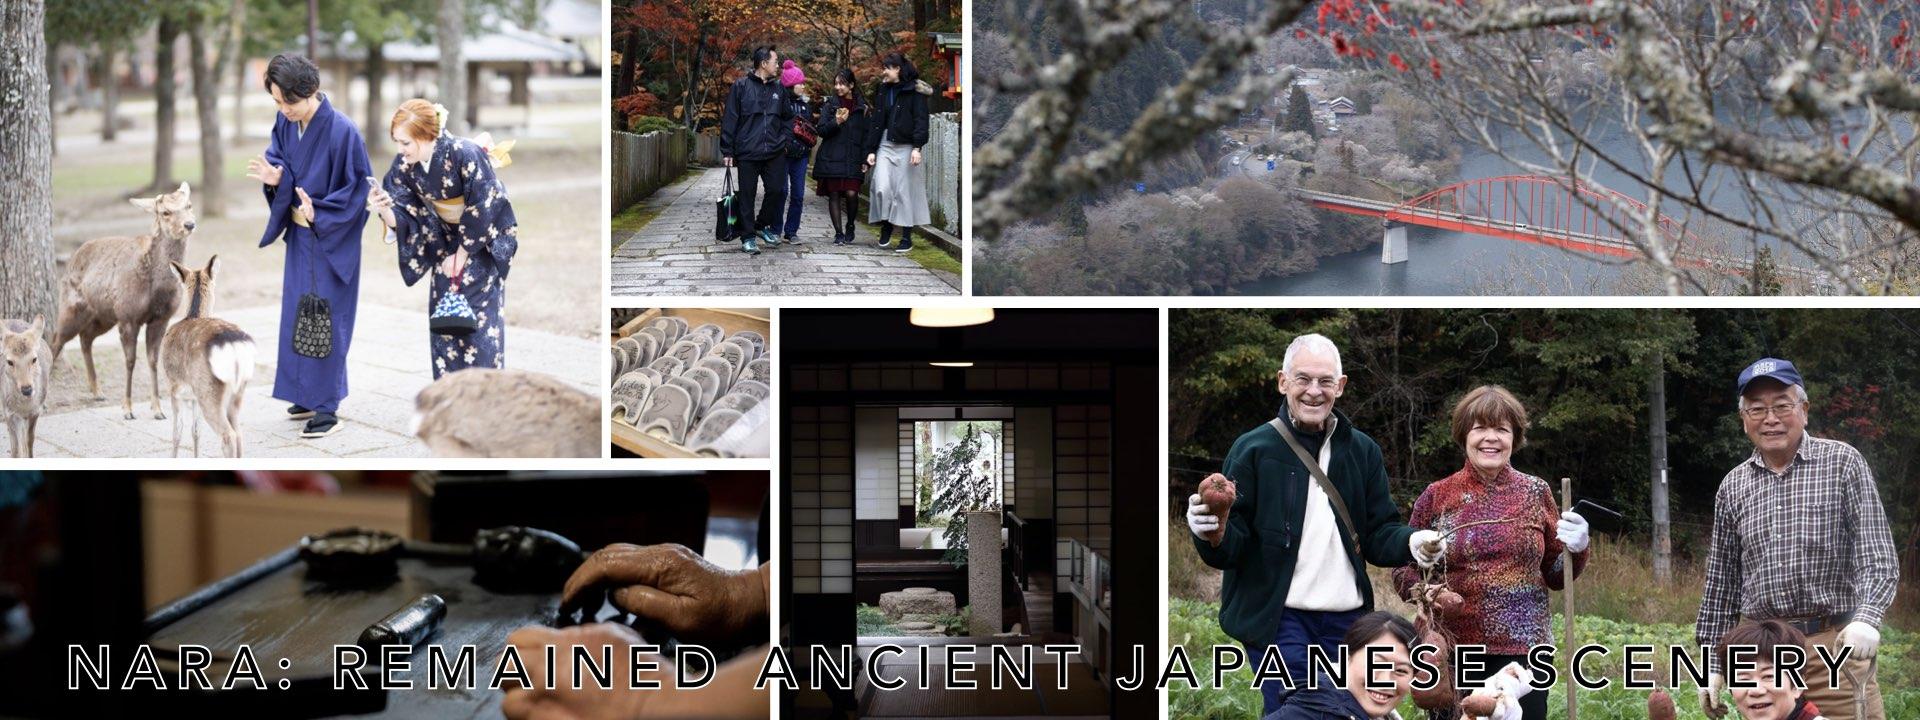 Nara: Remained ancient Japanese scenery